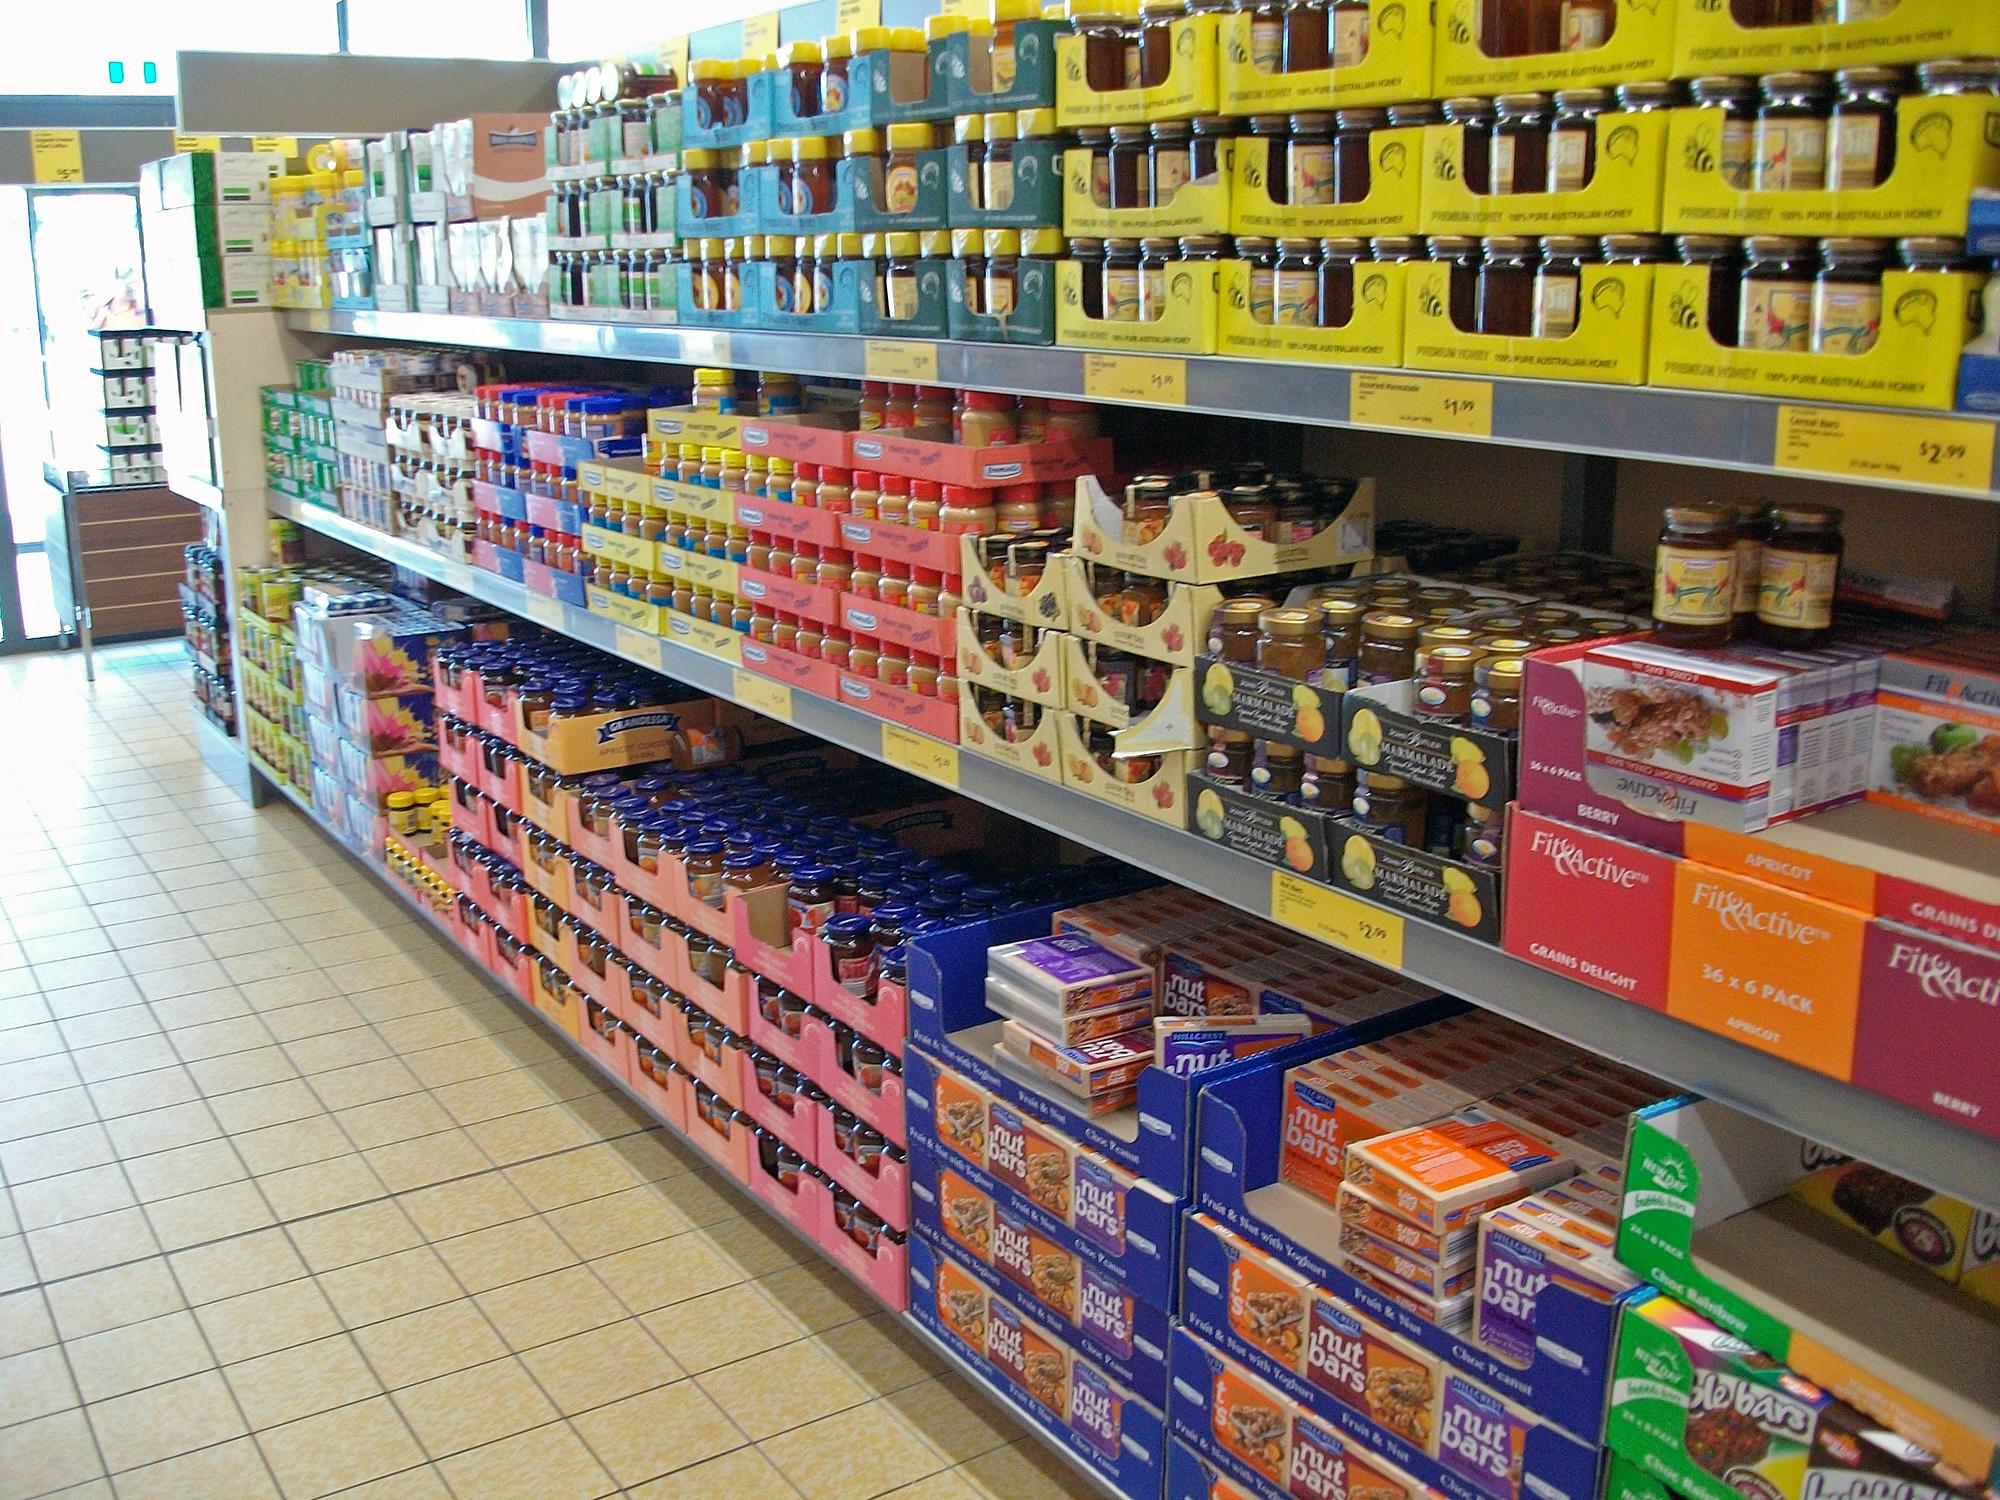 Shelving_in_an_Aldi_store_in_Australia.jpg